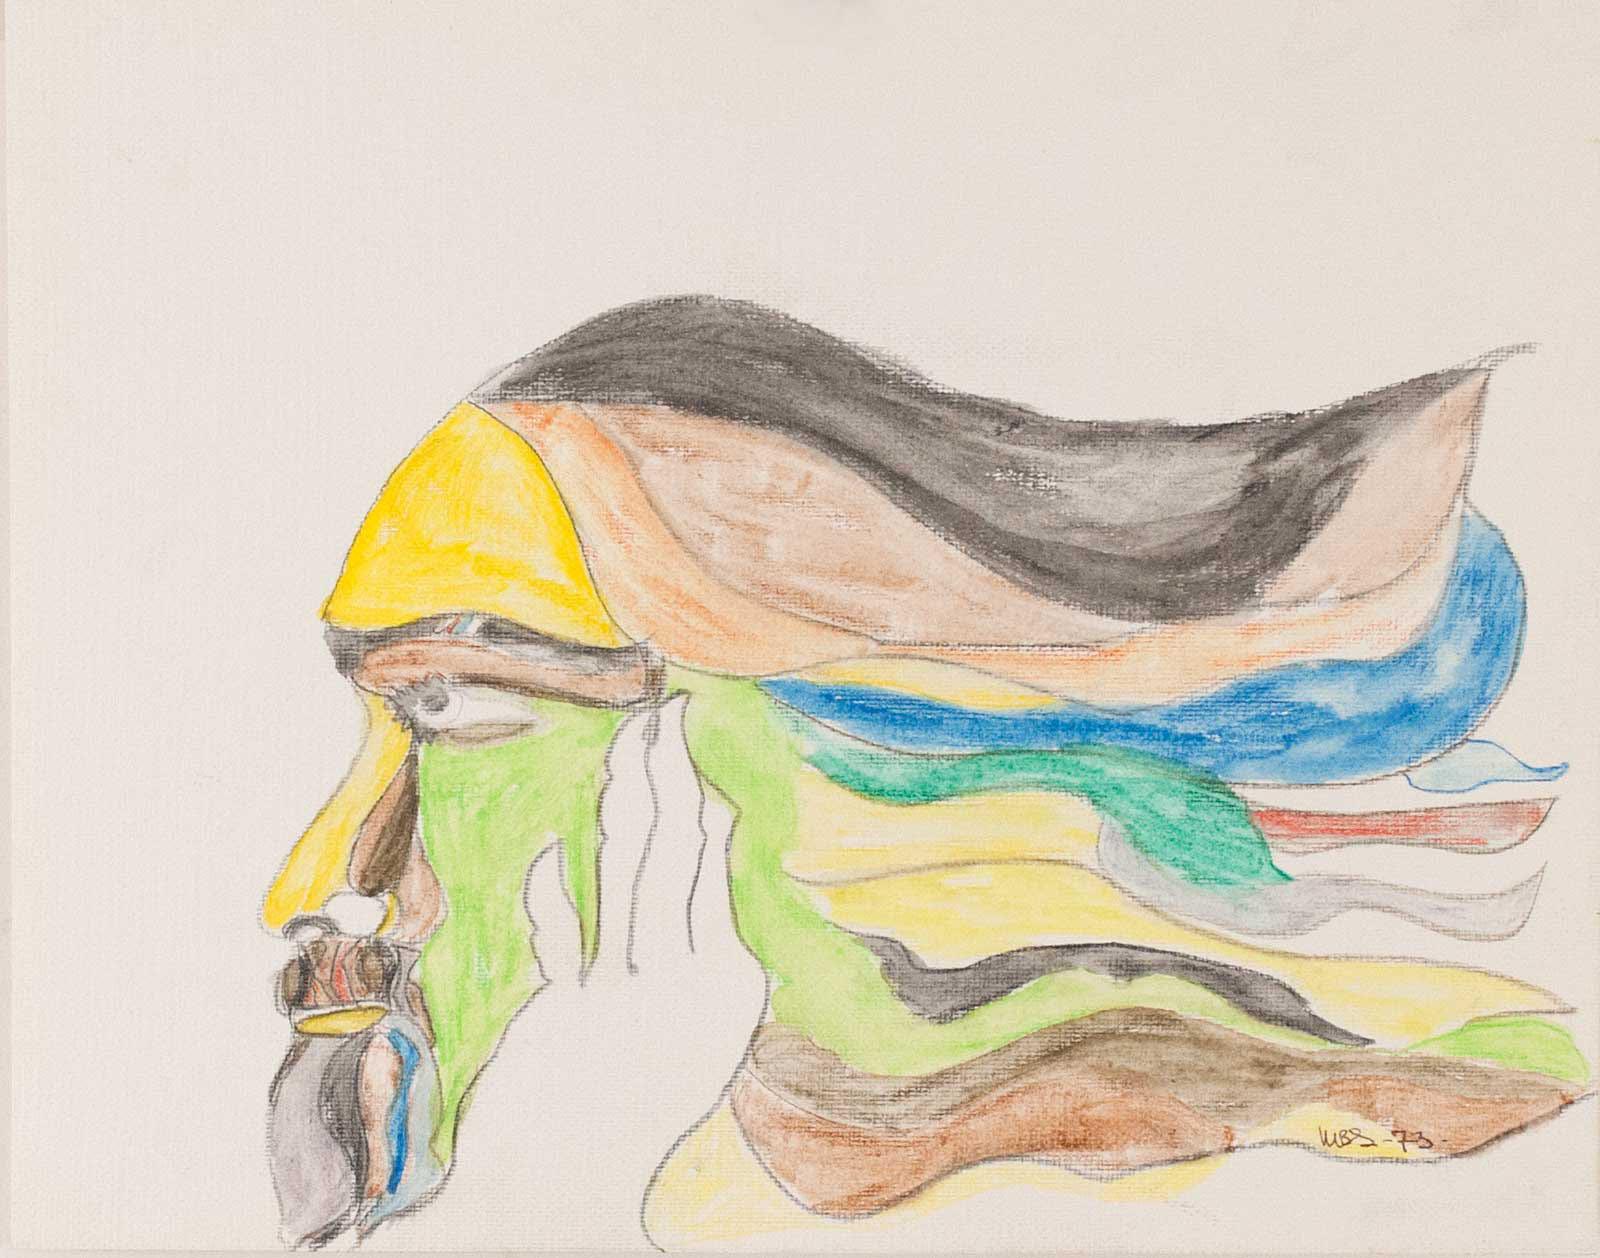 1824-MBS-1973-pencil-on-canvas-_sguahu.jpg